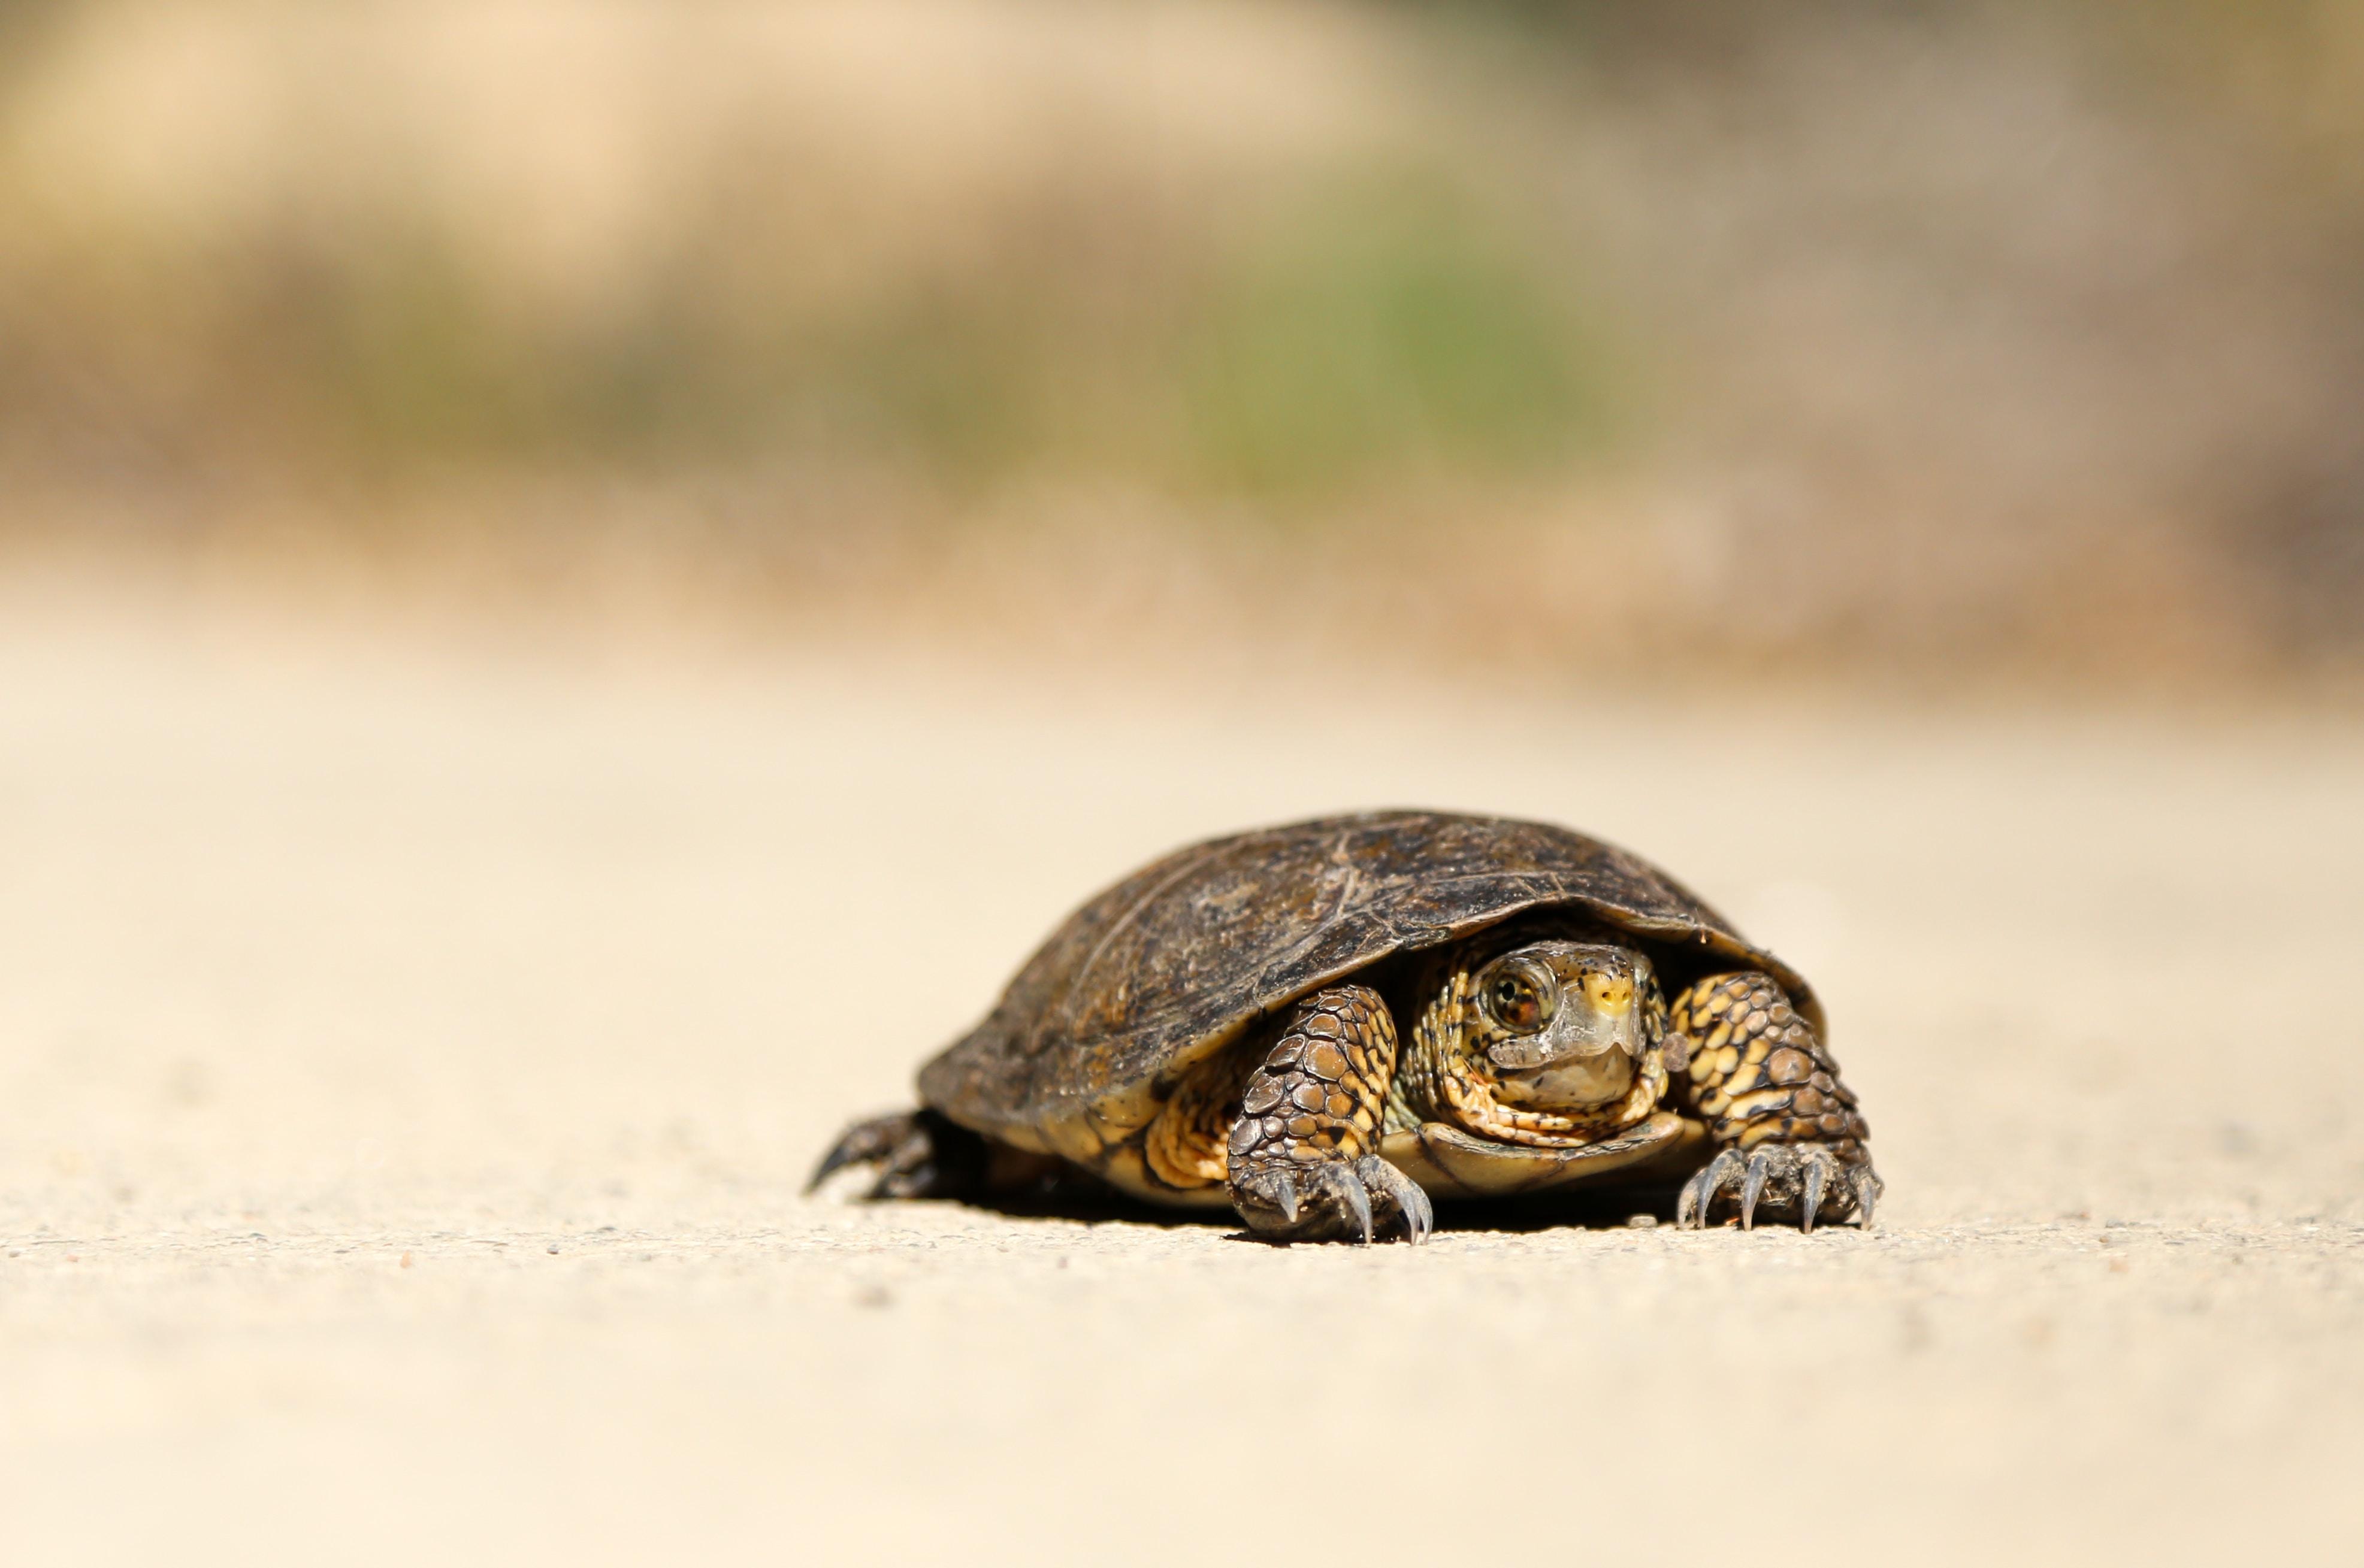 A small turtle sitting on the sandy beach in Santa Barbara